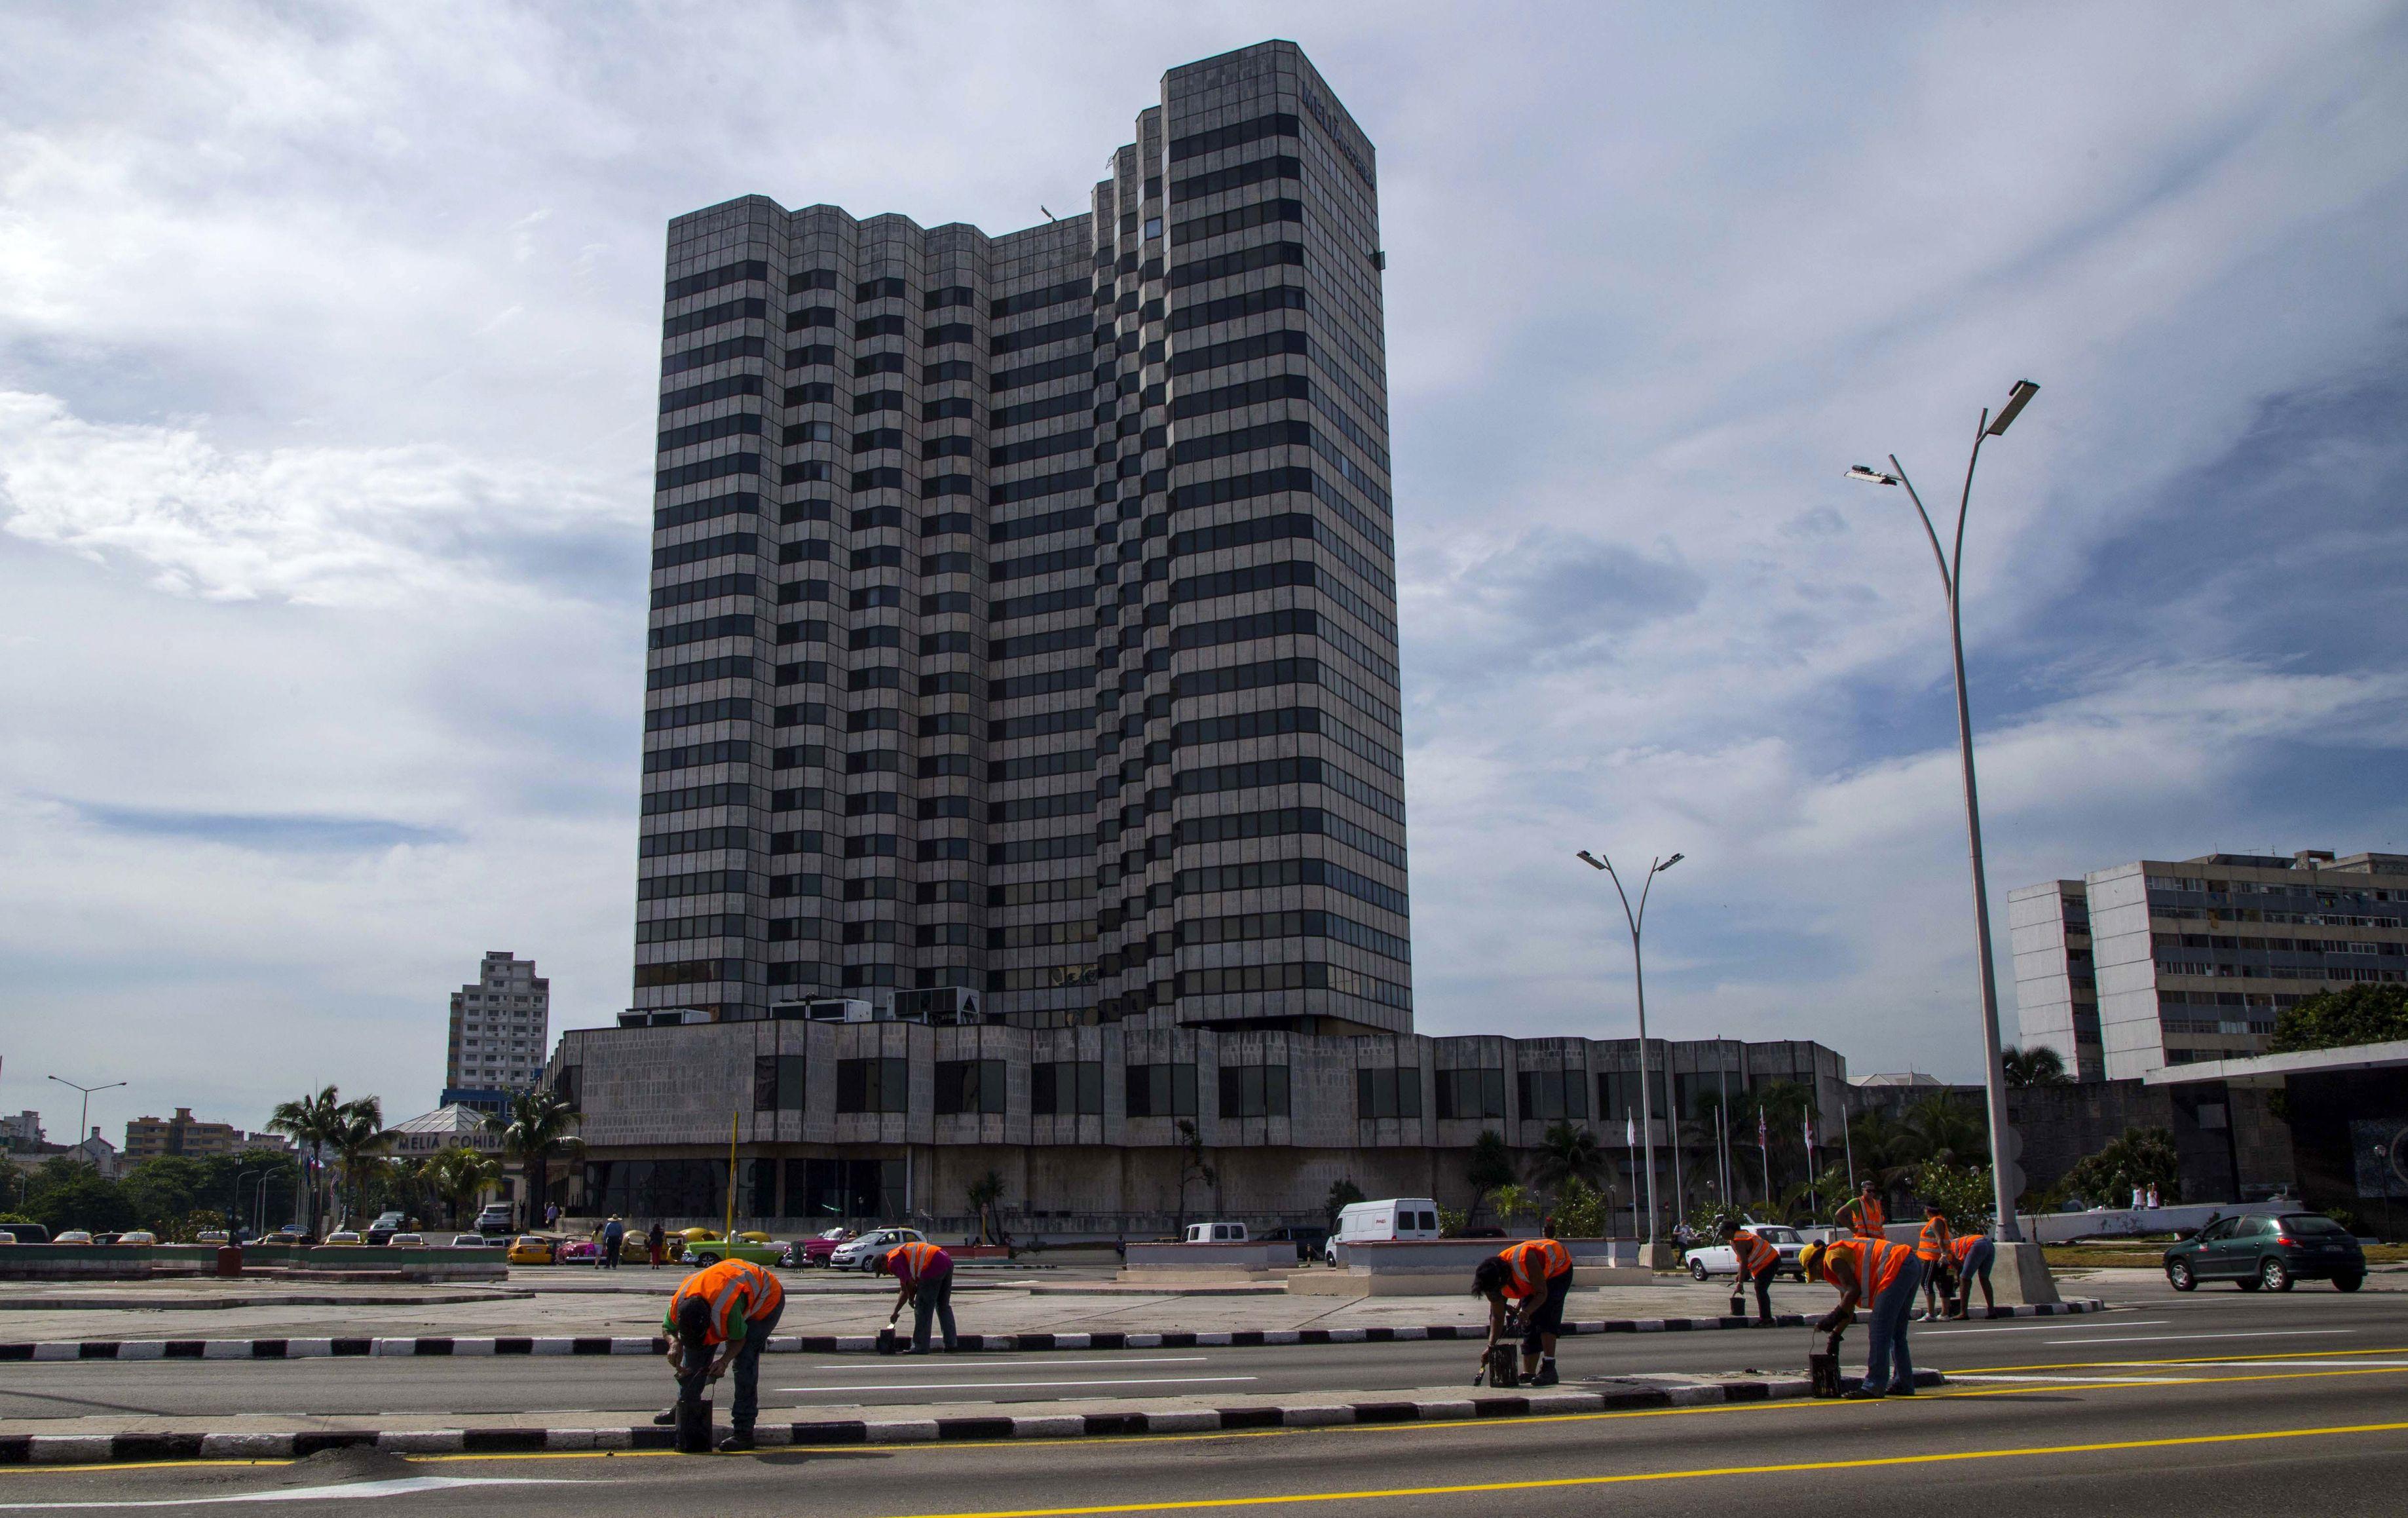 EEUU endurece embargo comercial a Cuba